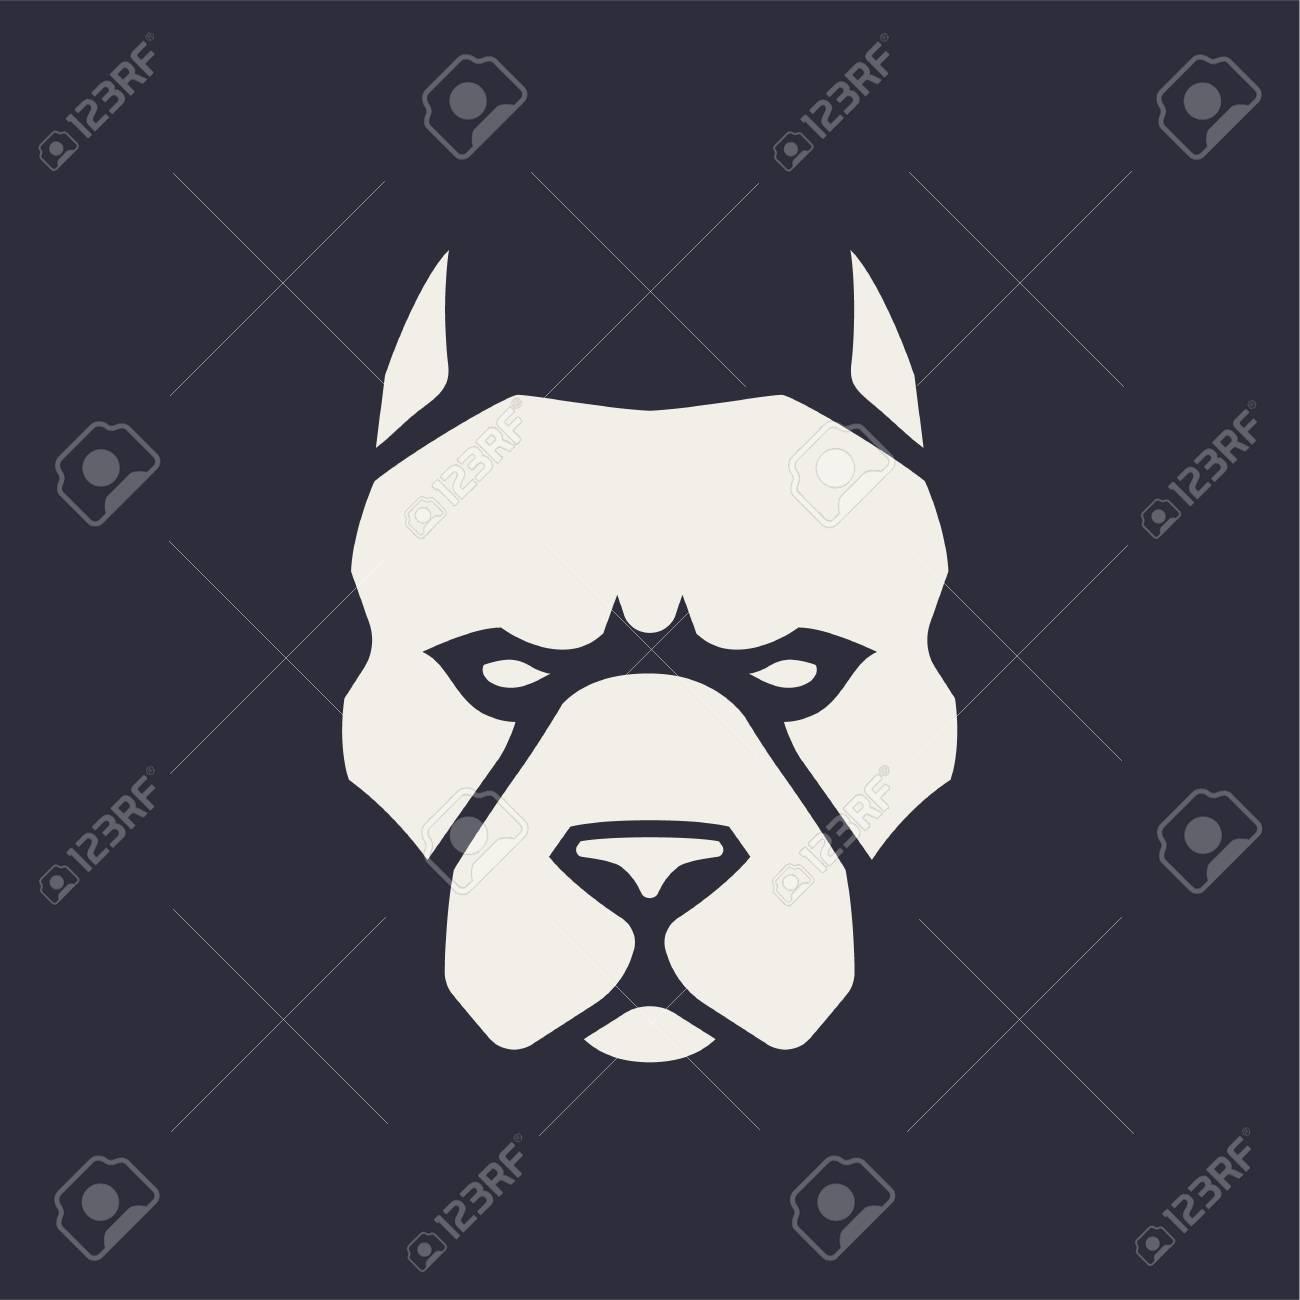 Pitbull mascot vector art  Frontal symmetric image of pitbull